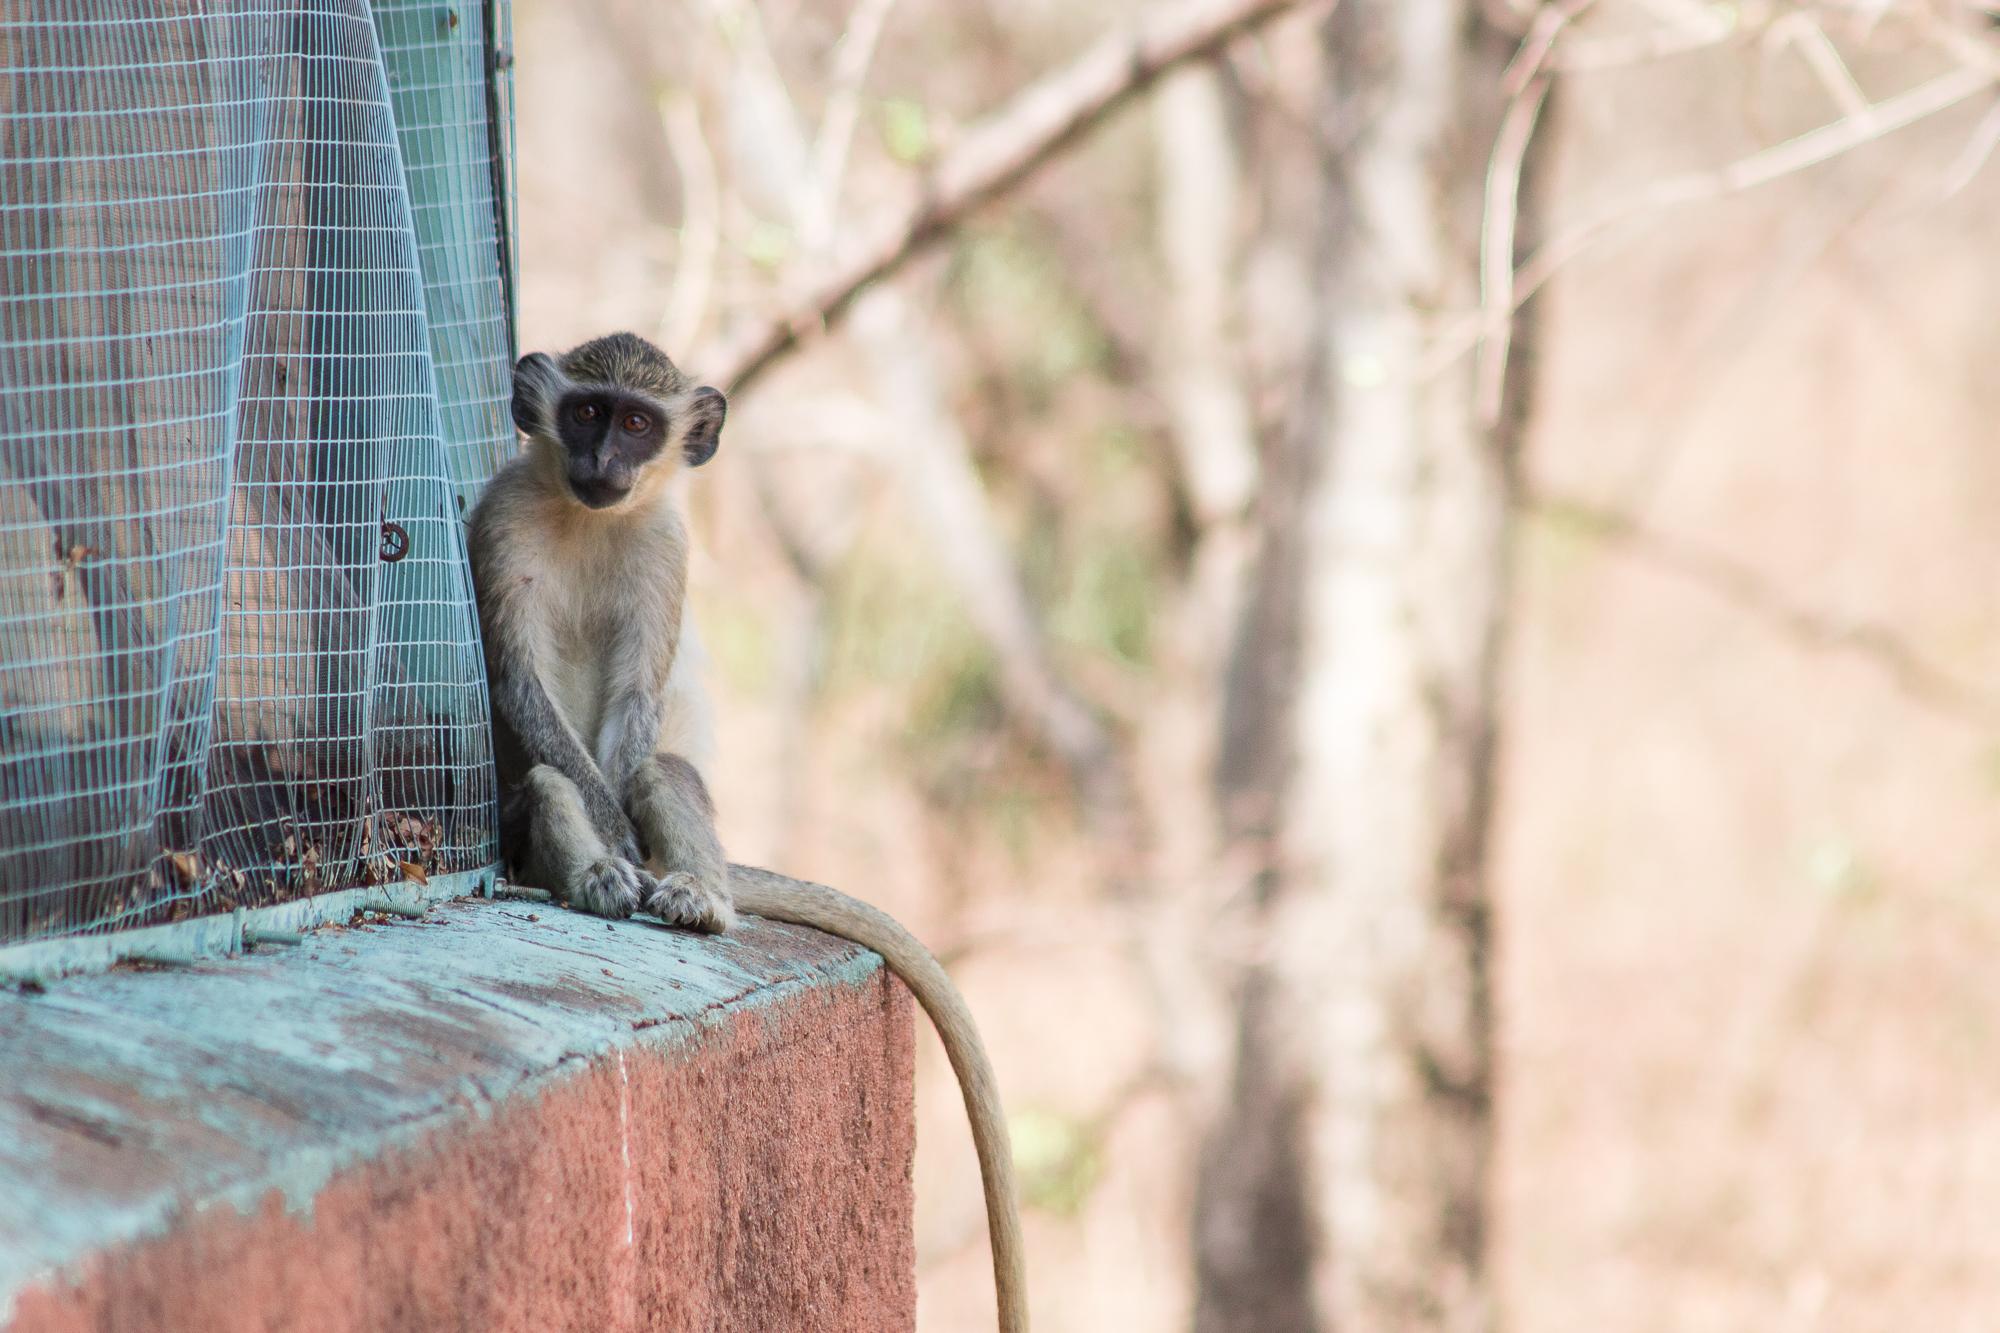 Singe vert dans la réserve de Nazinga, Burkina Faso